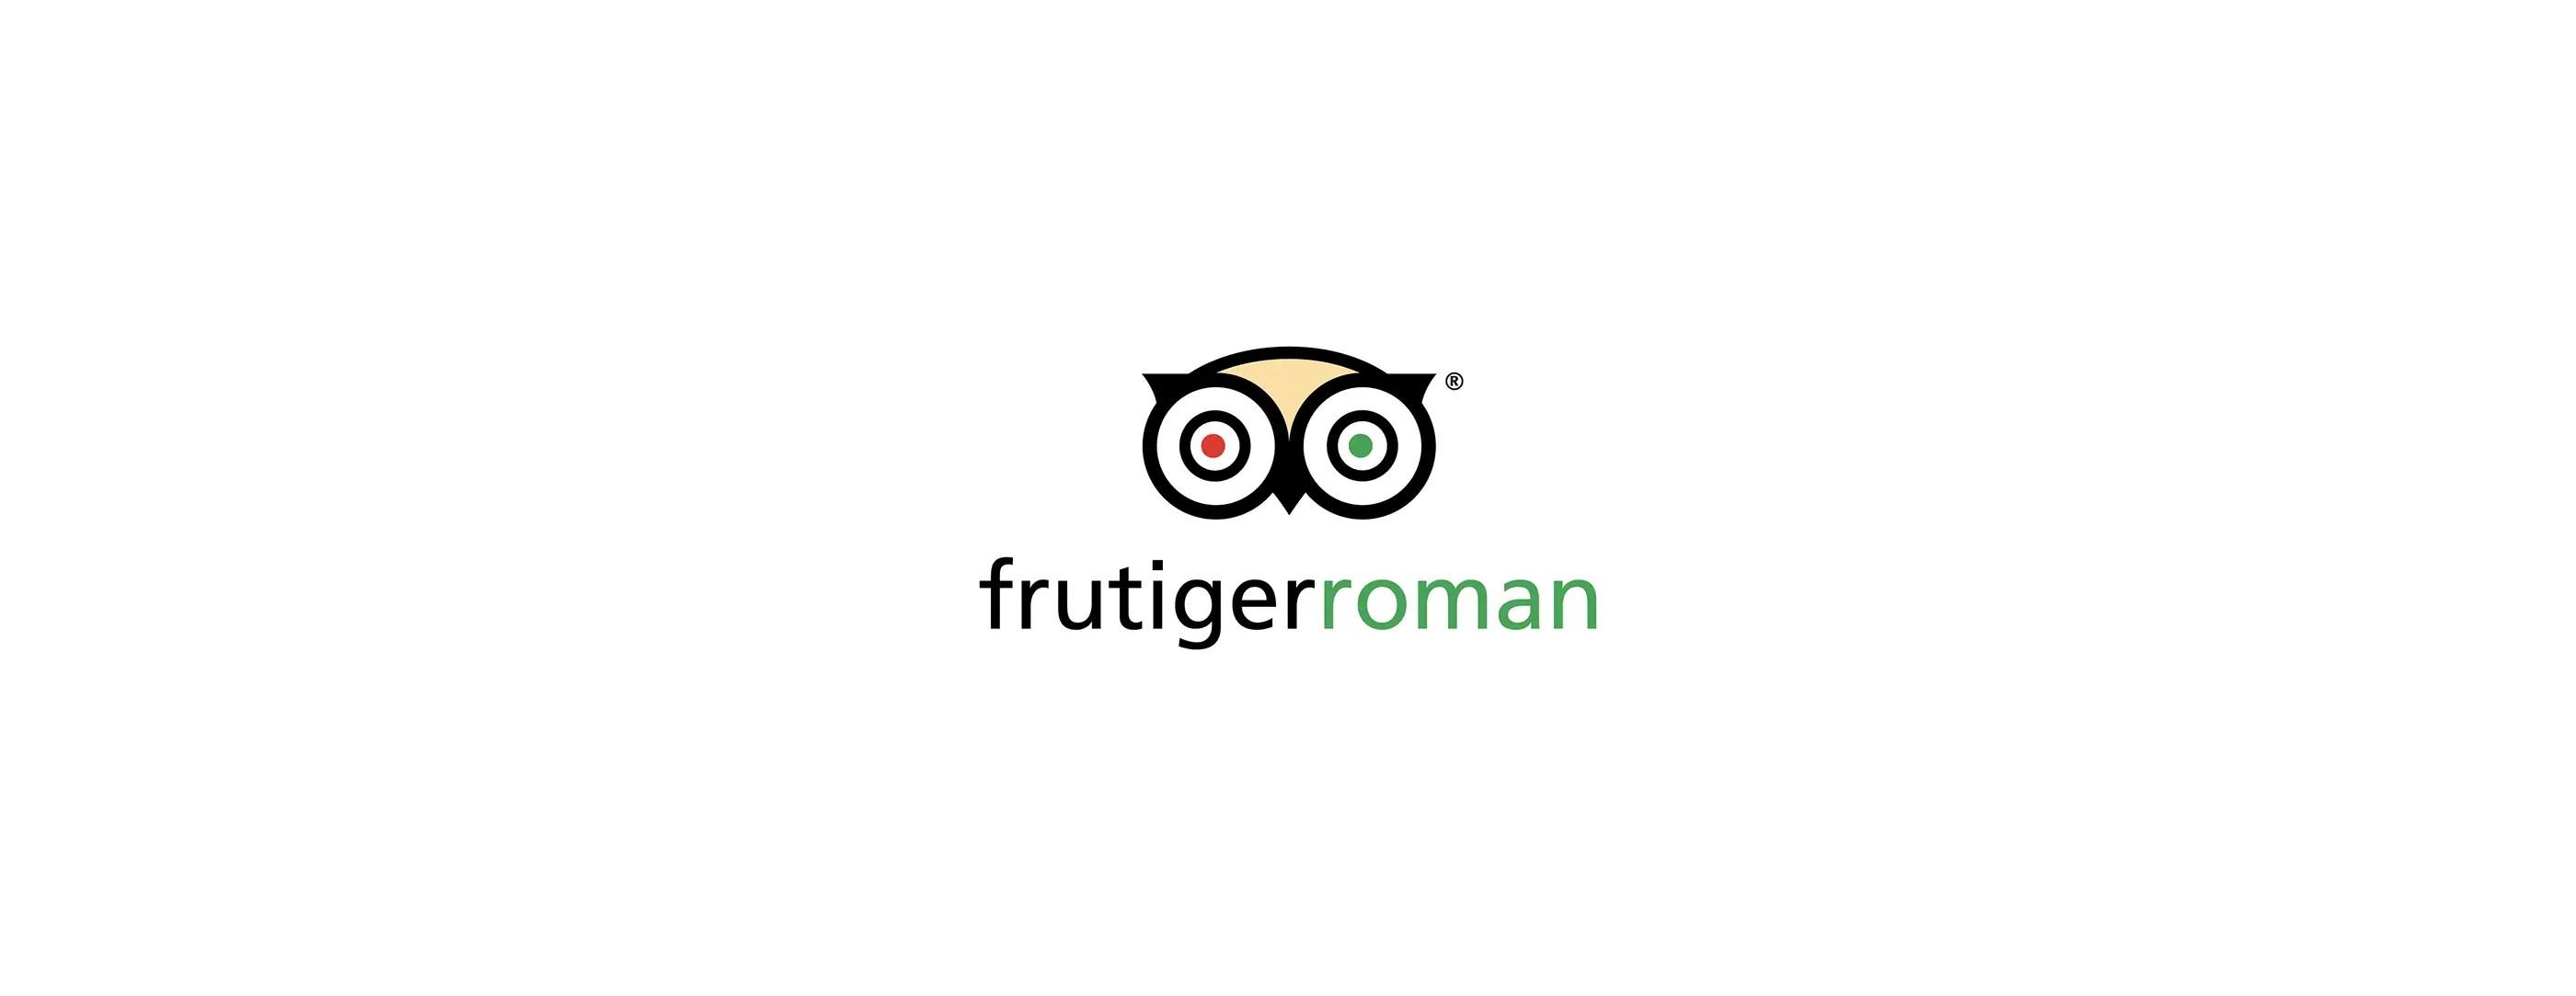 wersm-logo-font-tripadvisor-frutiger-roman